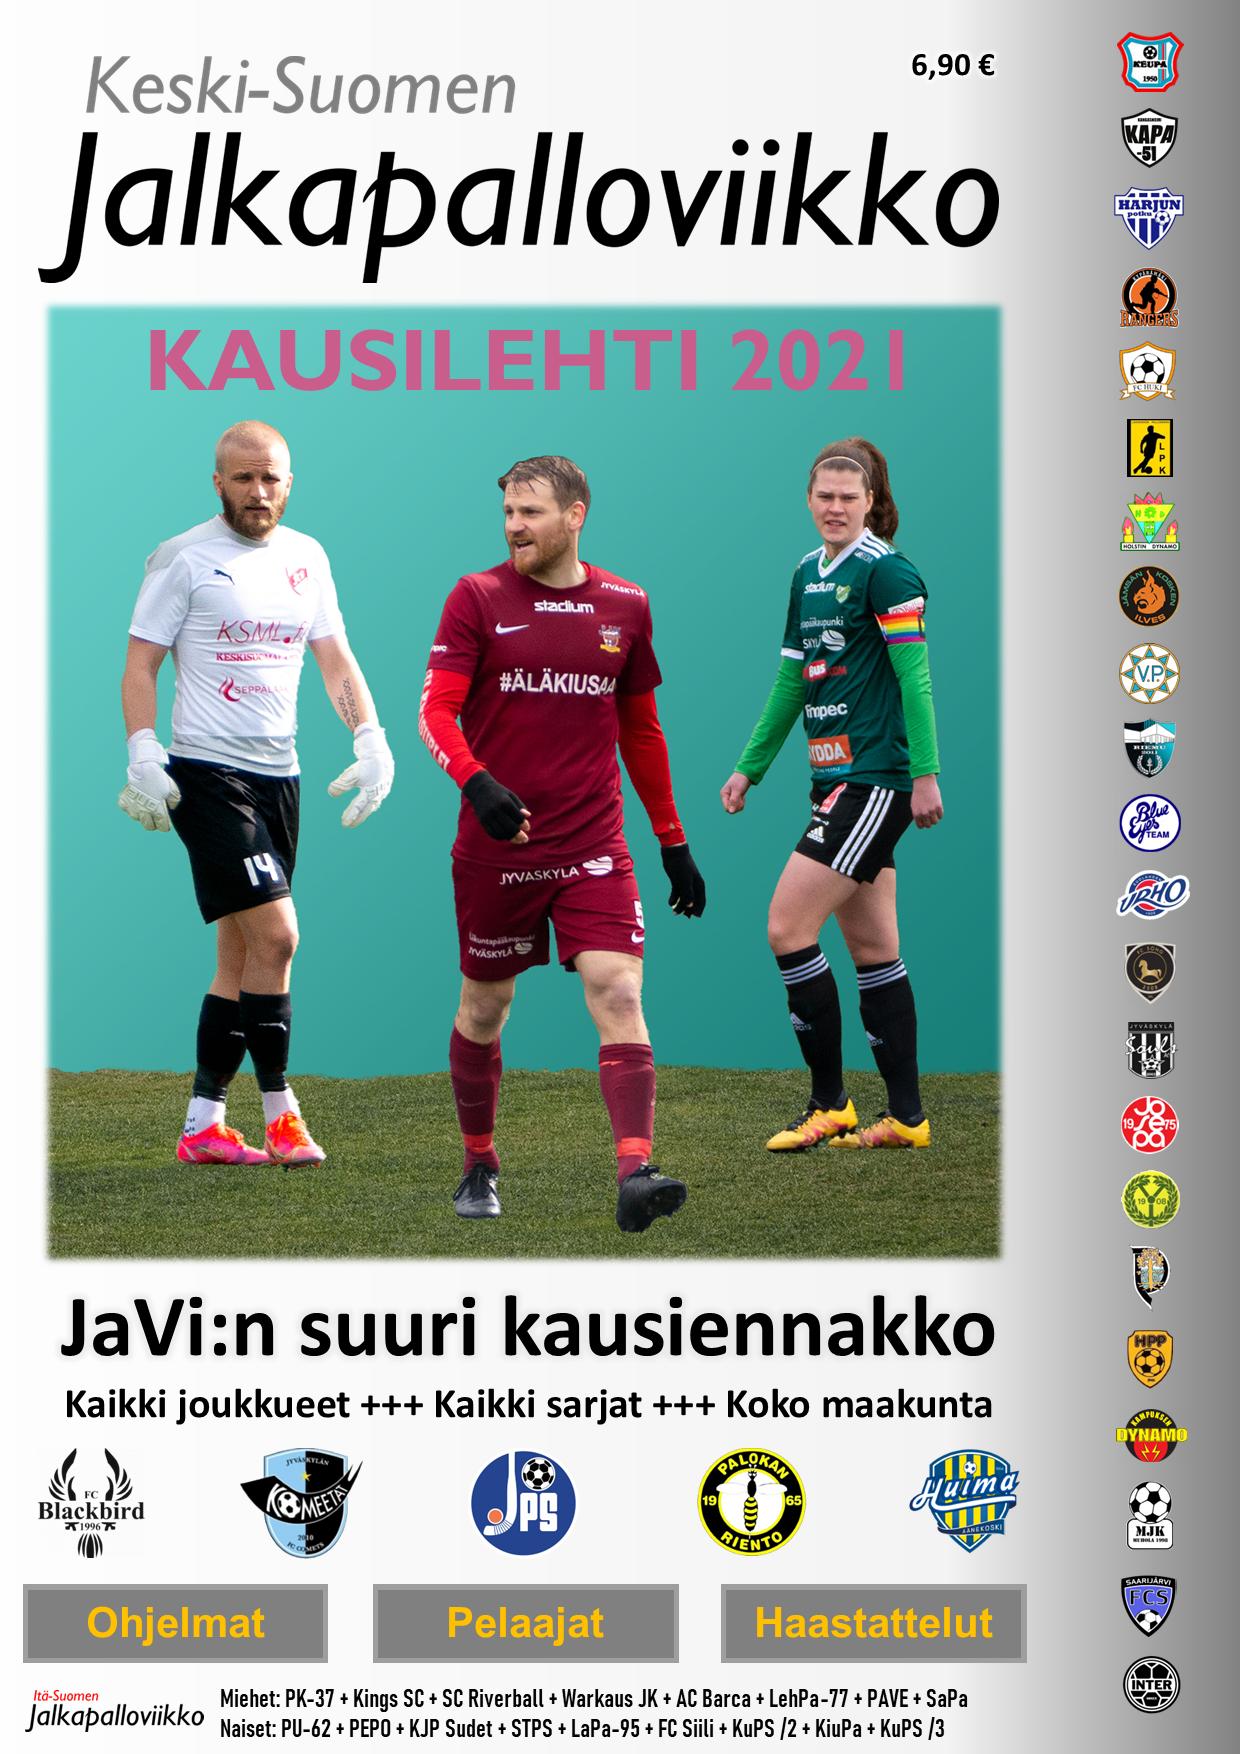 Keski-Suomen JaVi:n Kausilehti 2021